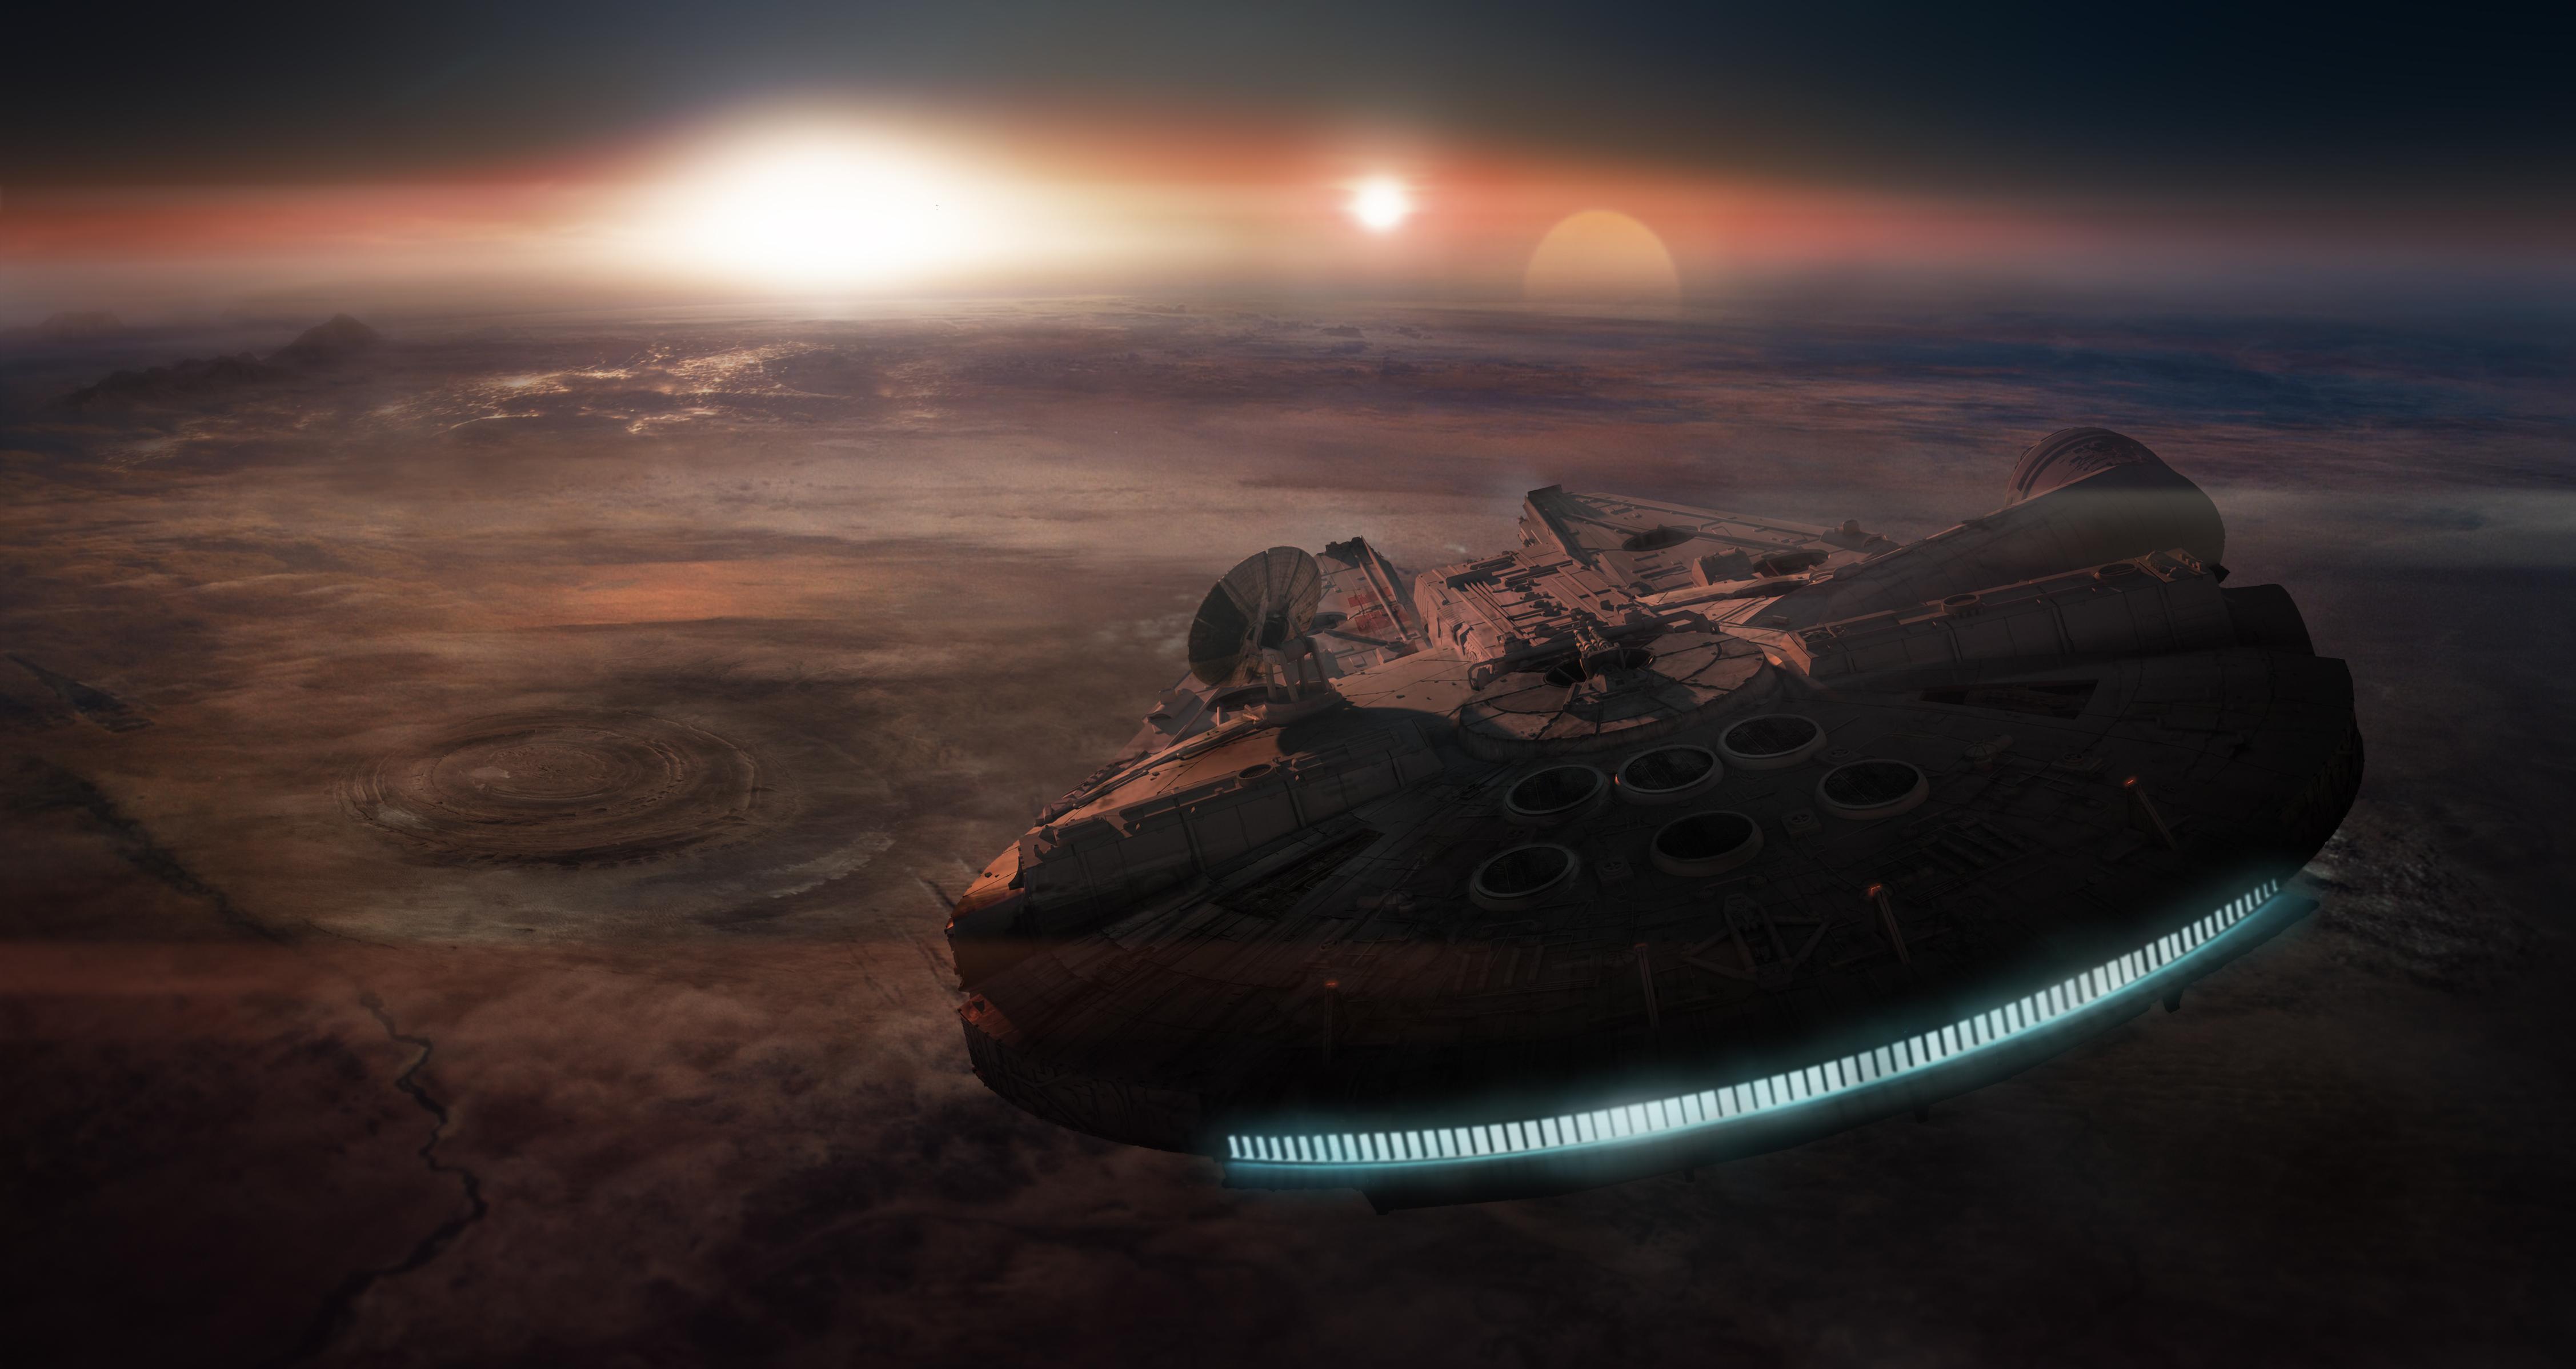 Falcon Over Tatooine by uPandazoic [4509x2306] iimgurcom 4509x2396